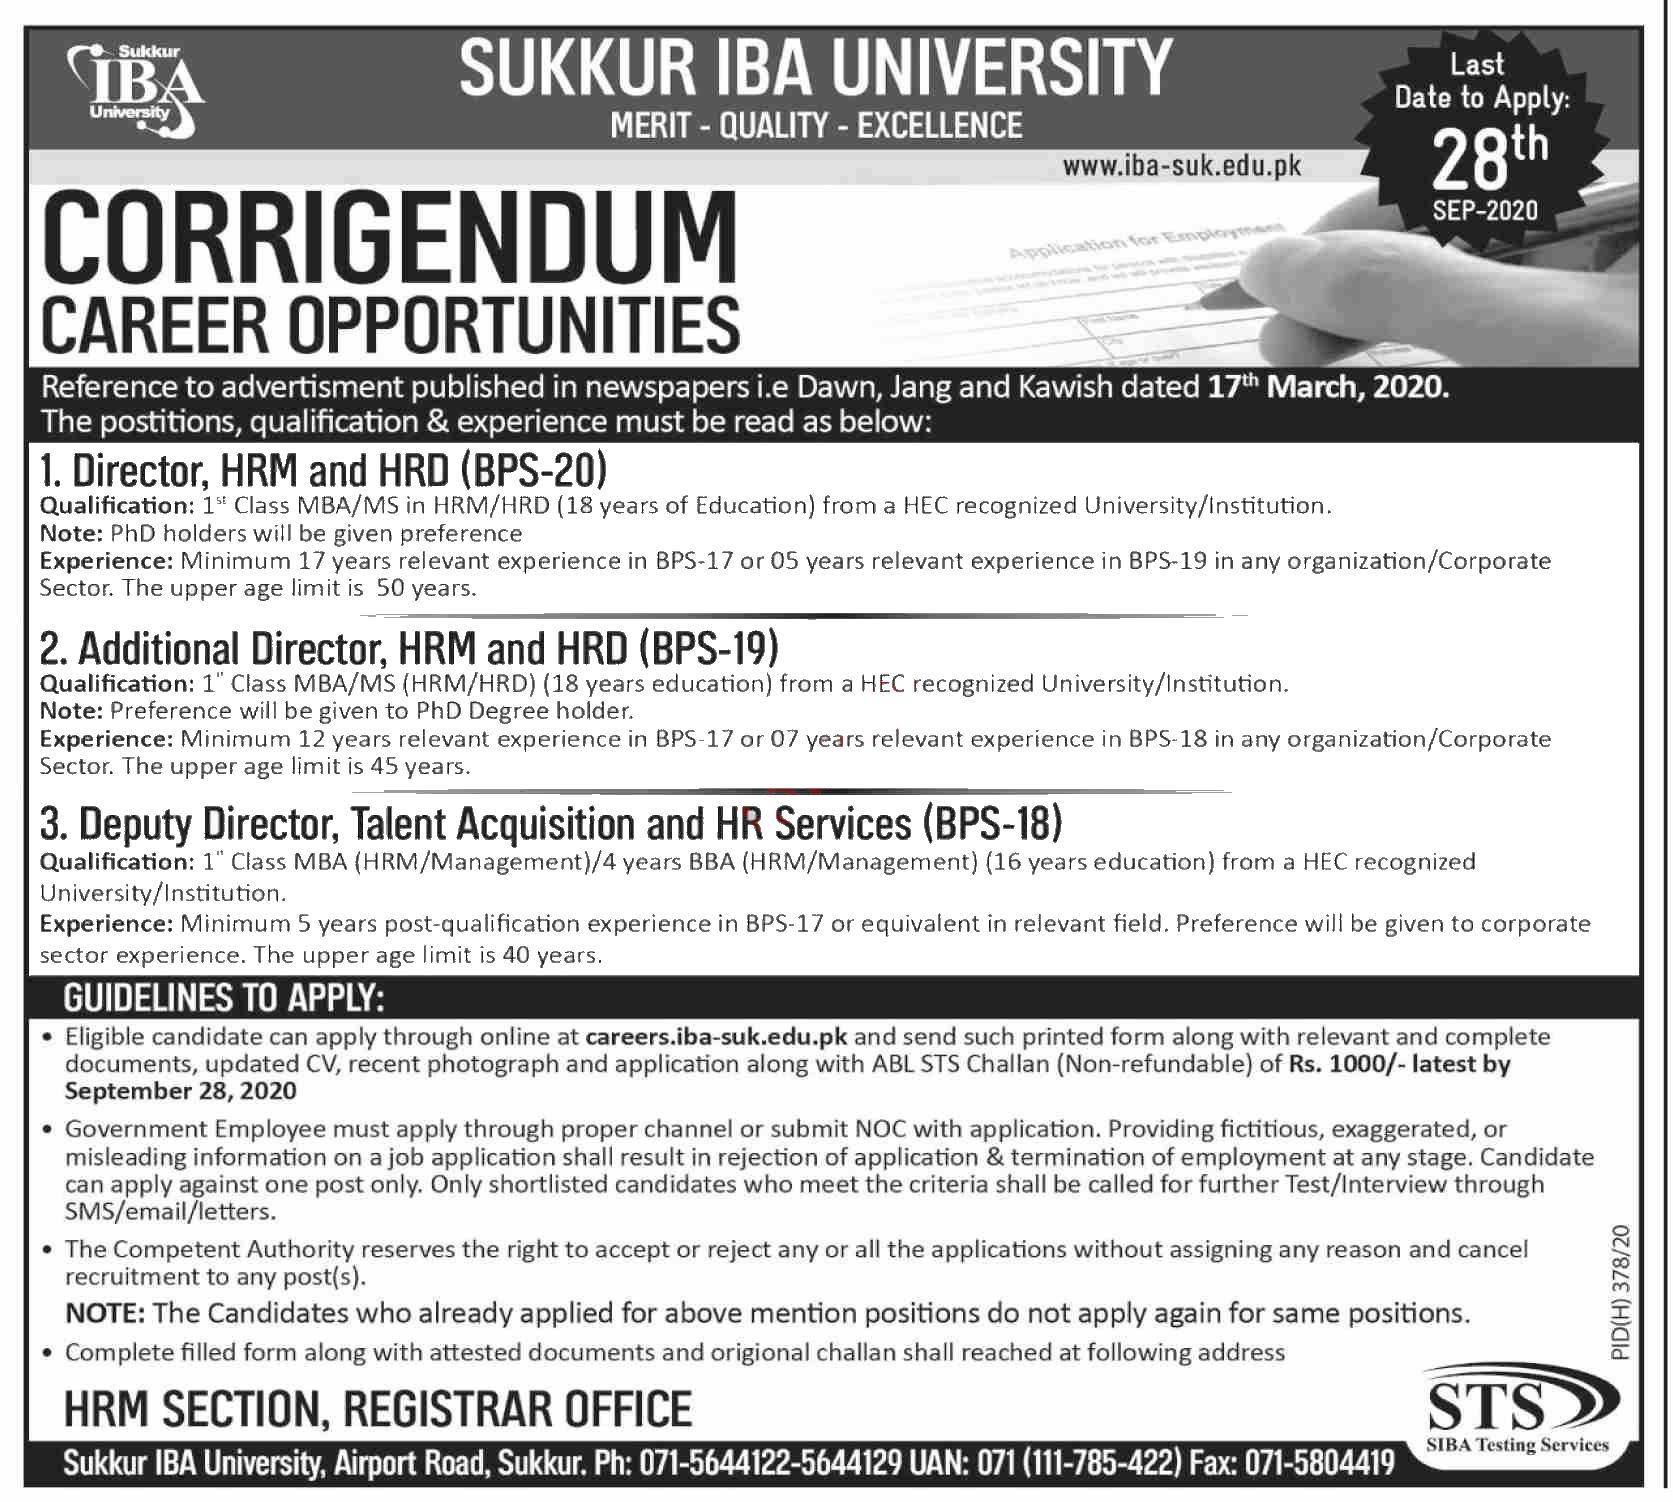 Jobs in Sukkur IBA University for Directors 10 September, 2020